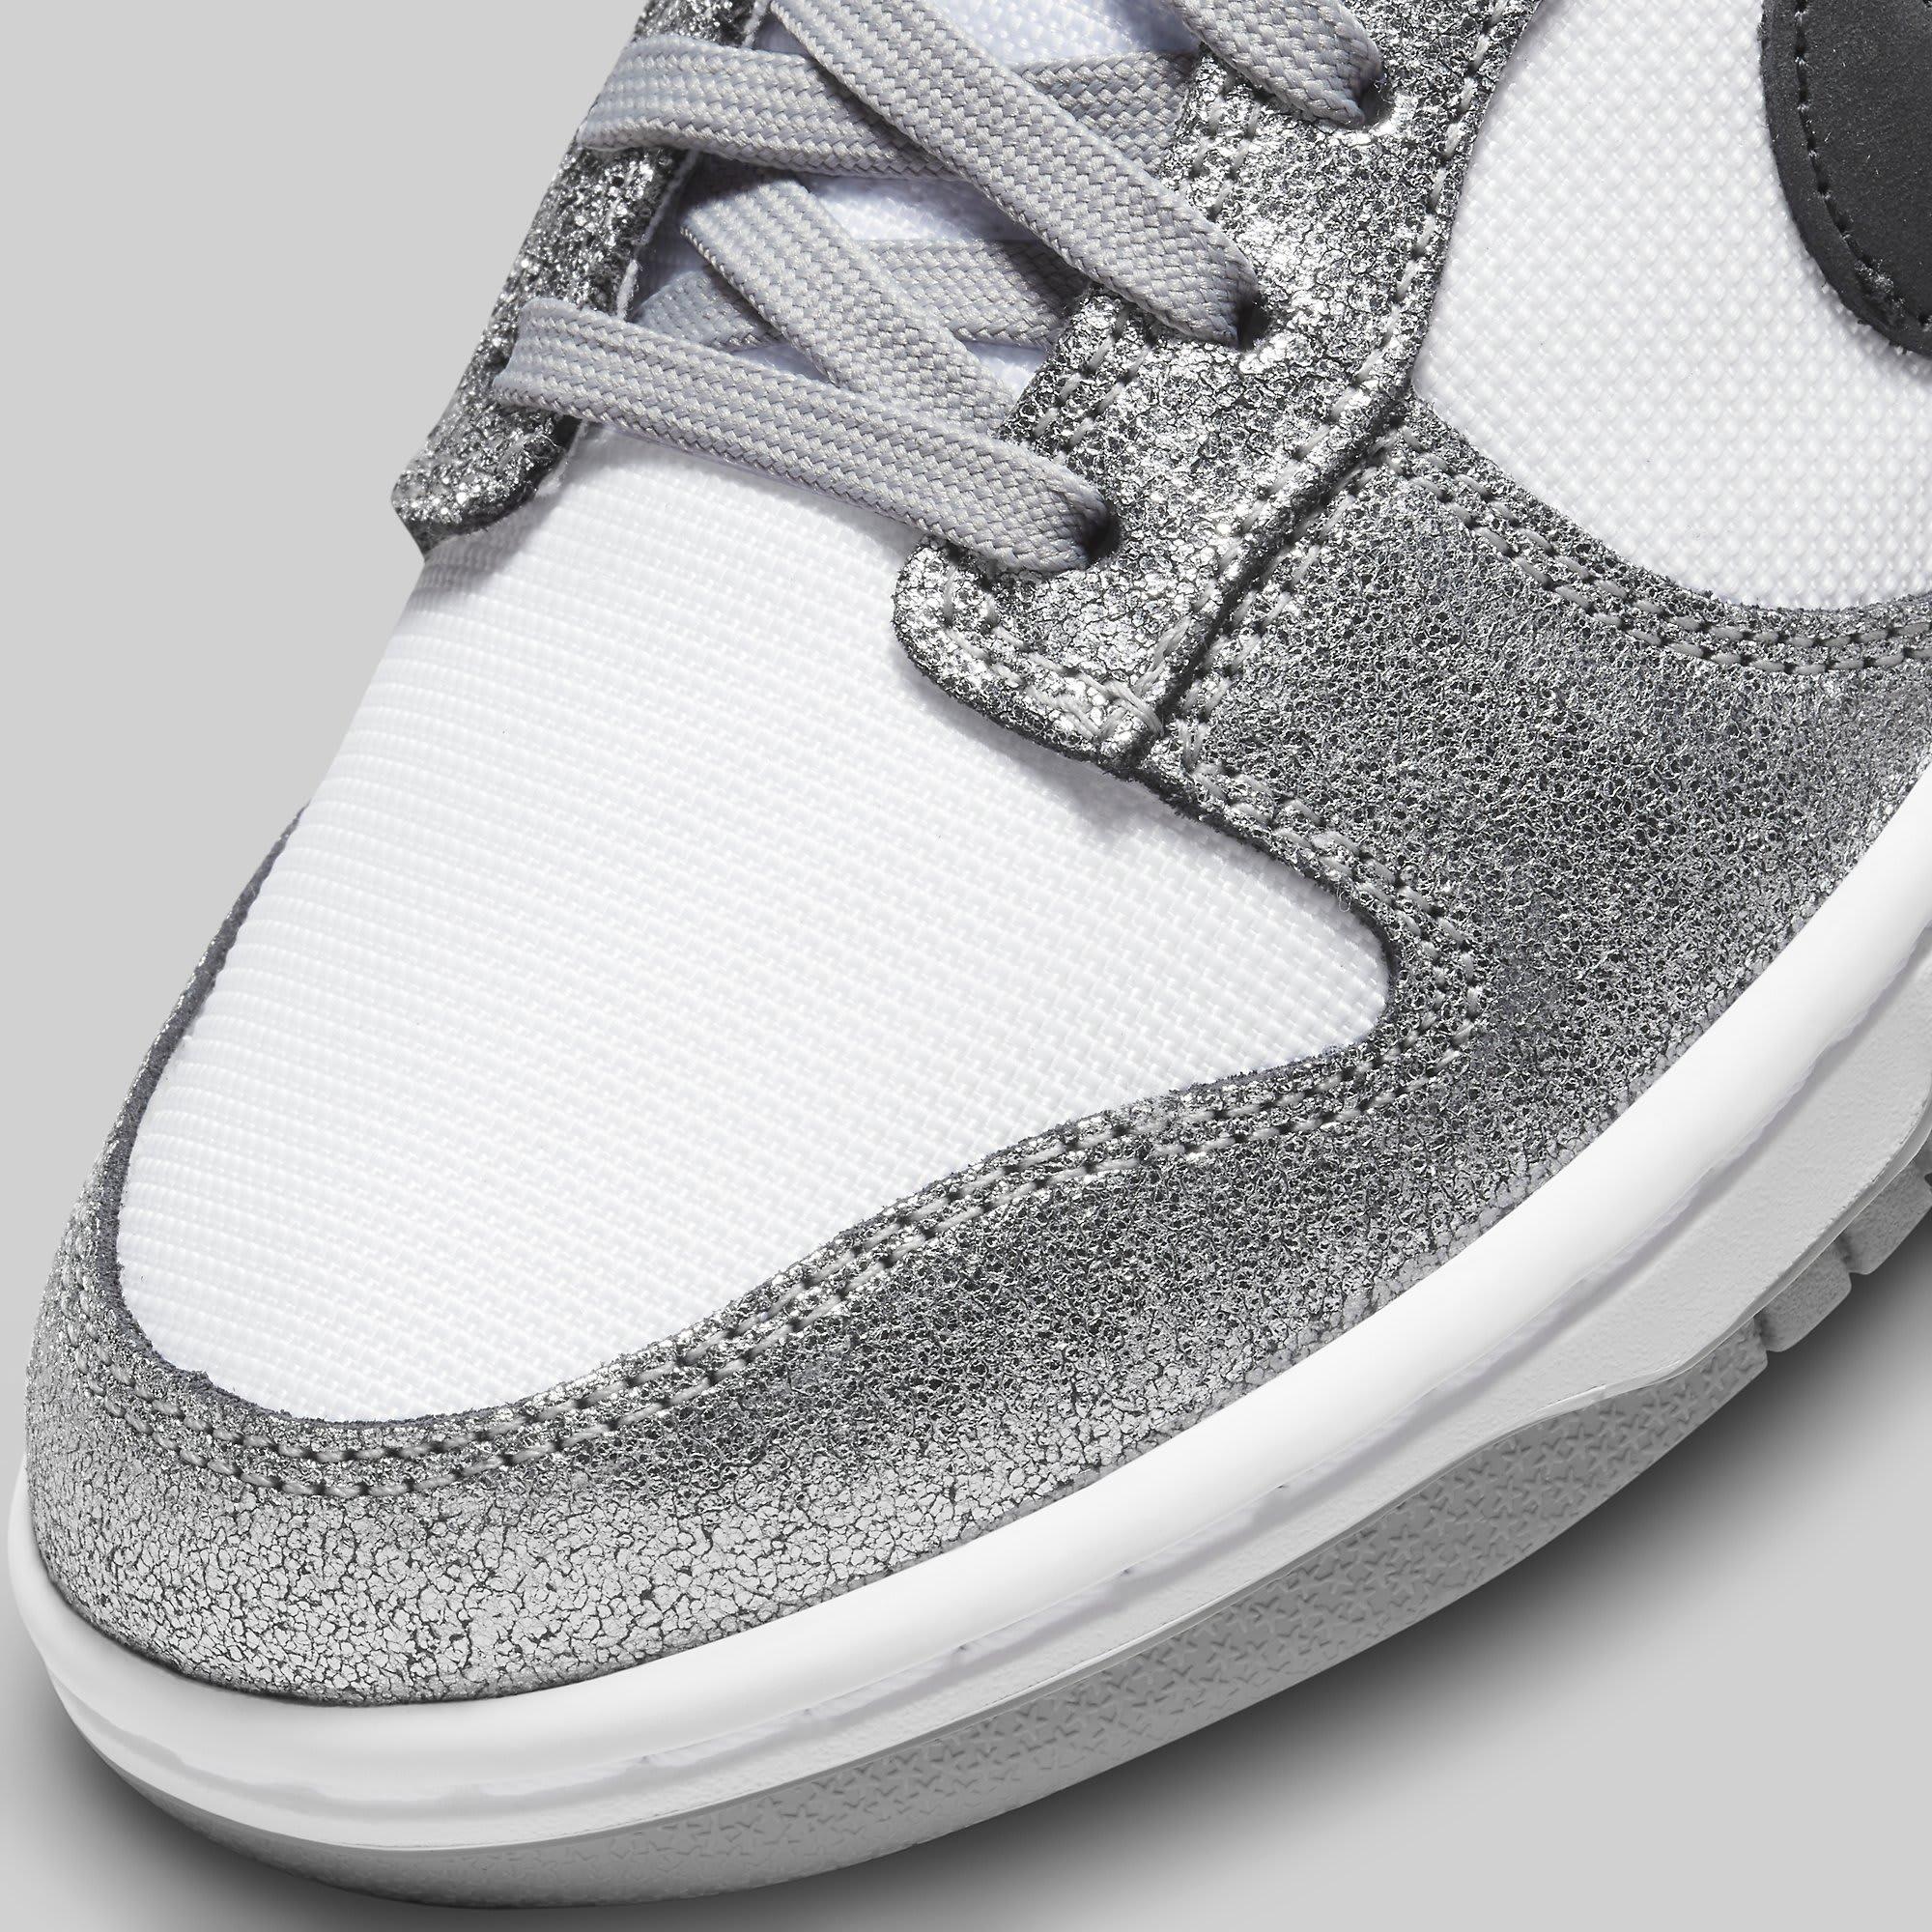 Nike Dunk Low 'Shimmer' DO5882-001 Toe